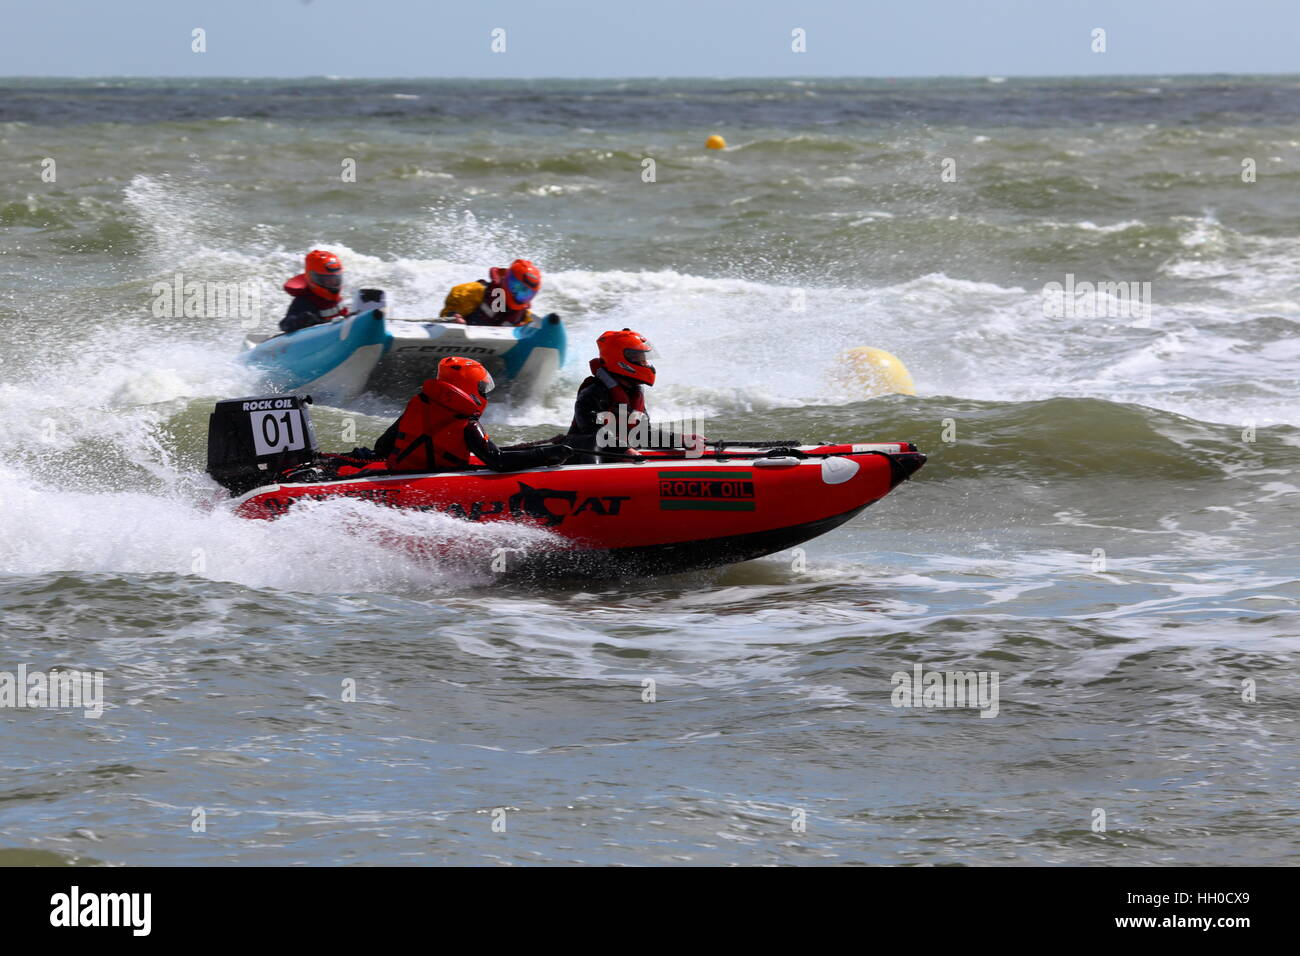 Zapcat offshore RIB circuit racing at Sandbanks Poole UK - Stock Image